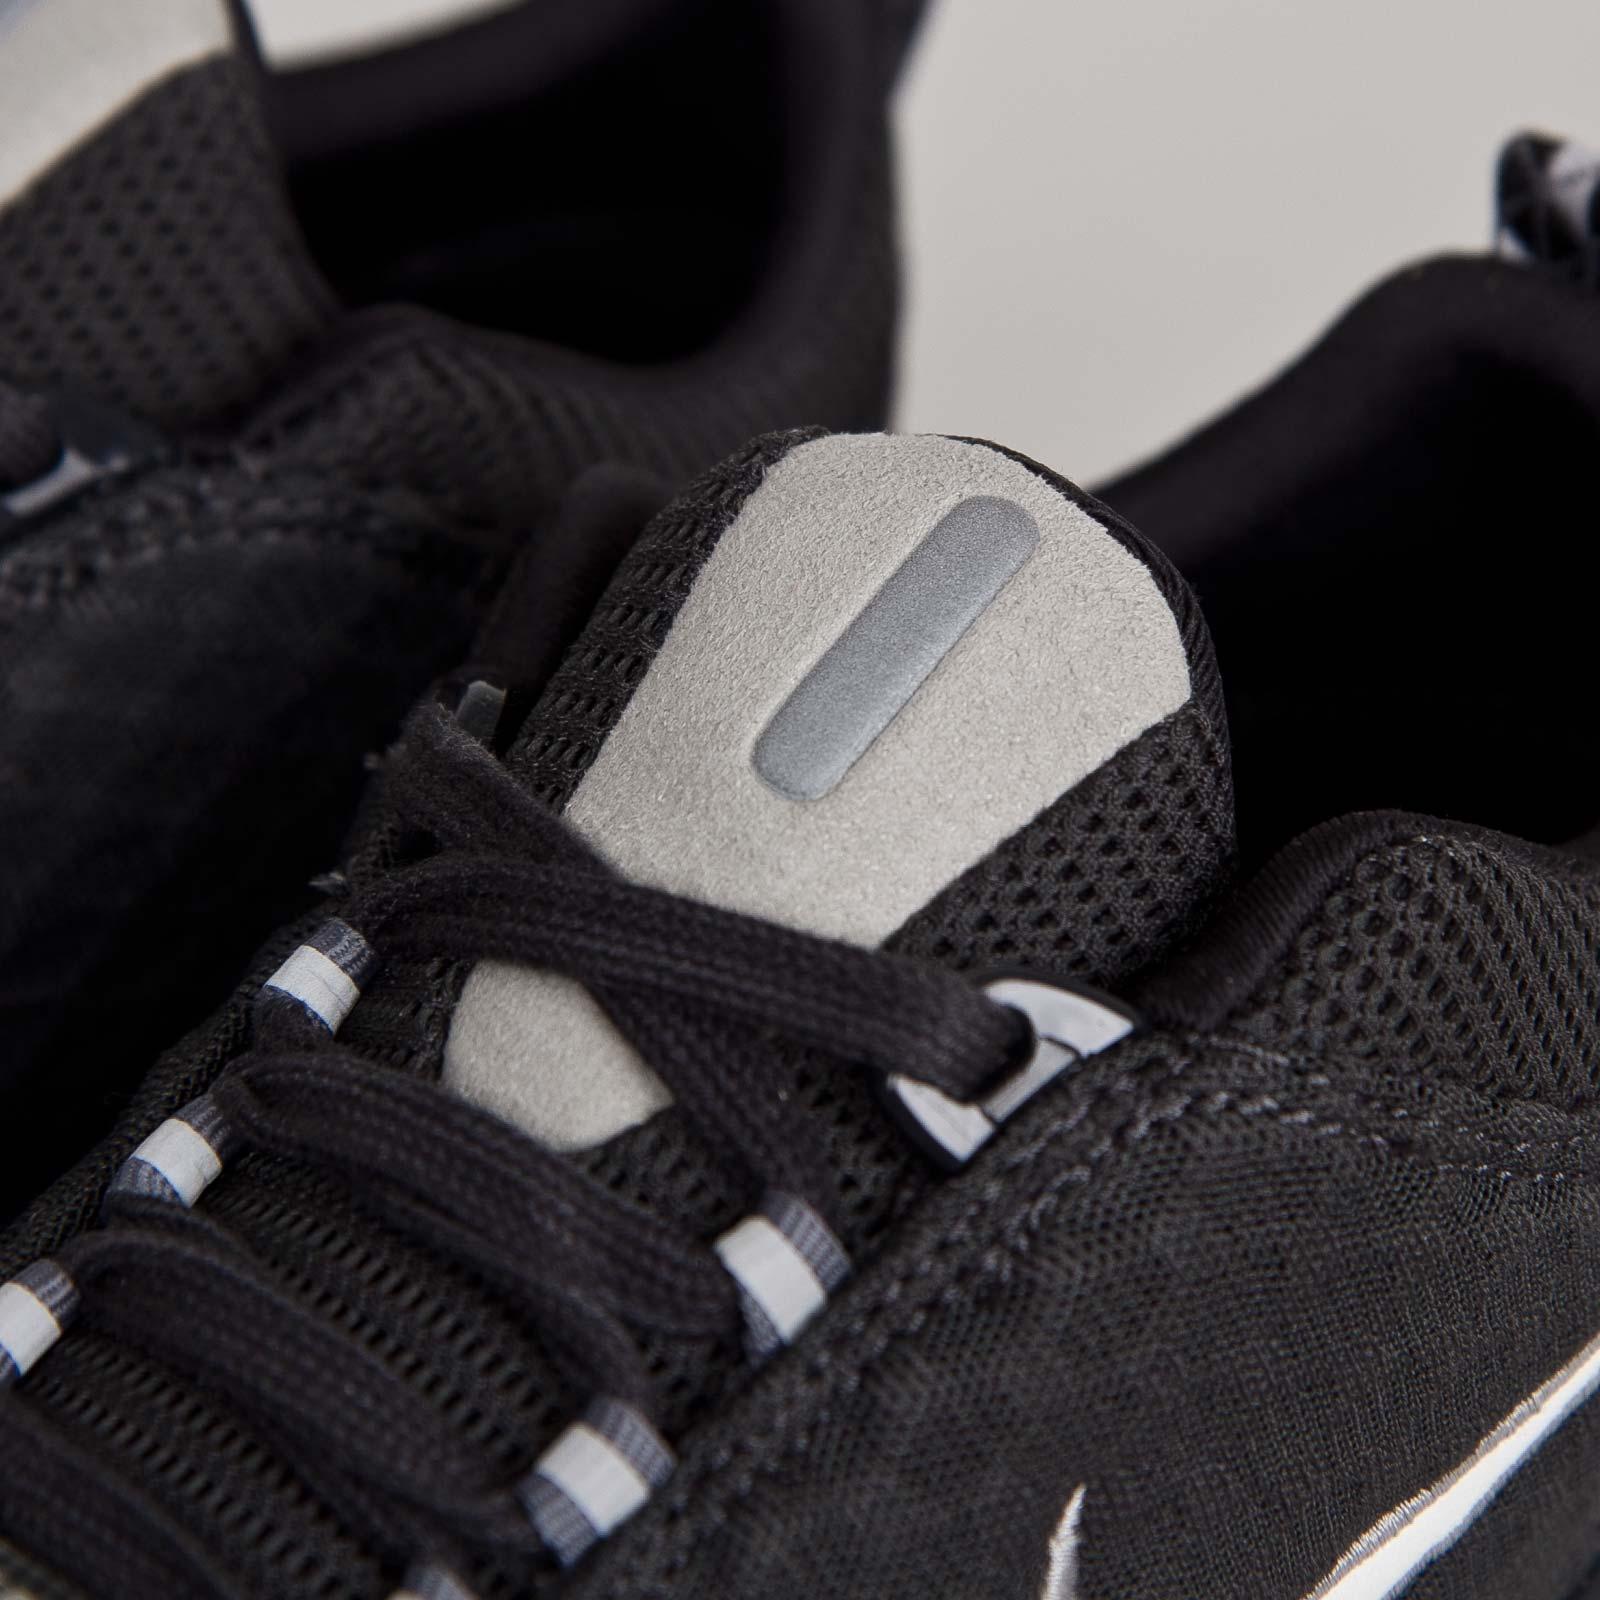 bd7324fd9b94 Nike Free OG 14 - 642402-010 - Sneakersnstuff